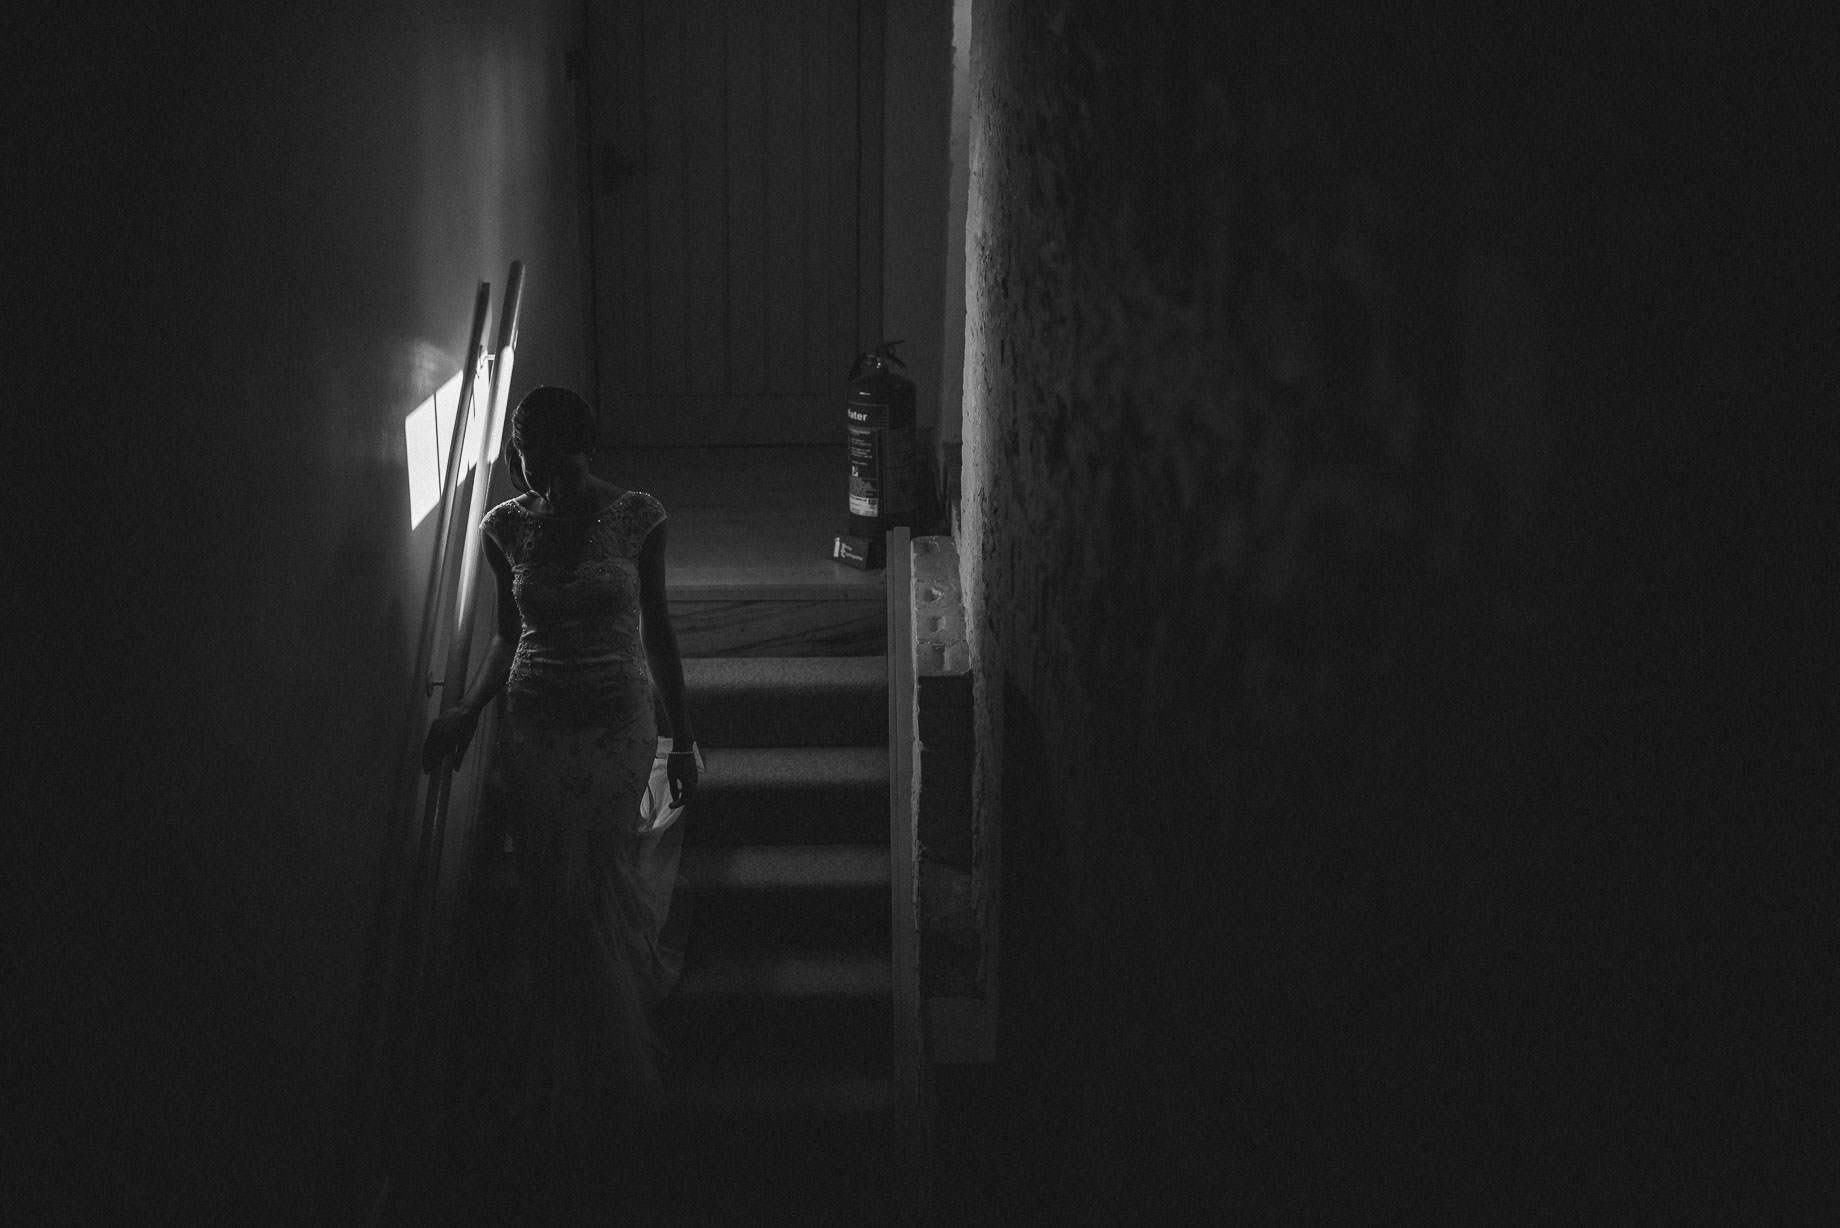 bury-court-barn-wedding-photography-guy-collier-photography-nadia-tom-40-of-184